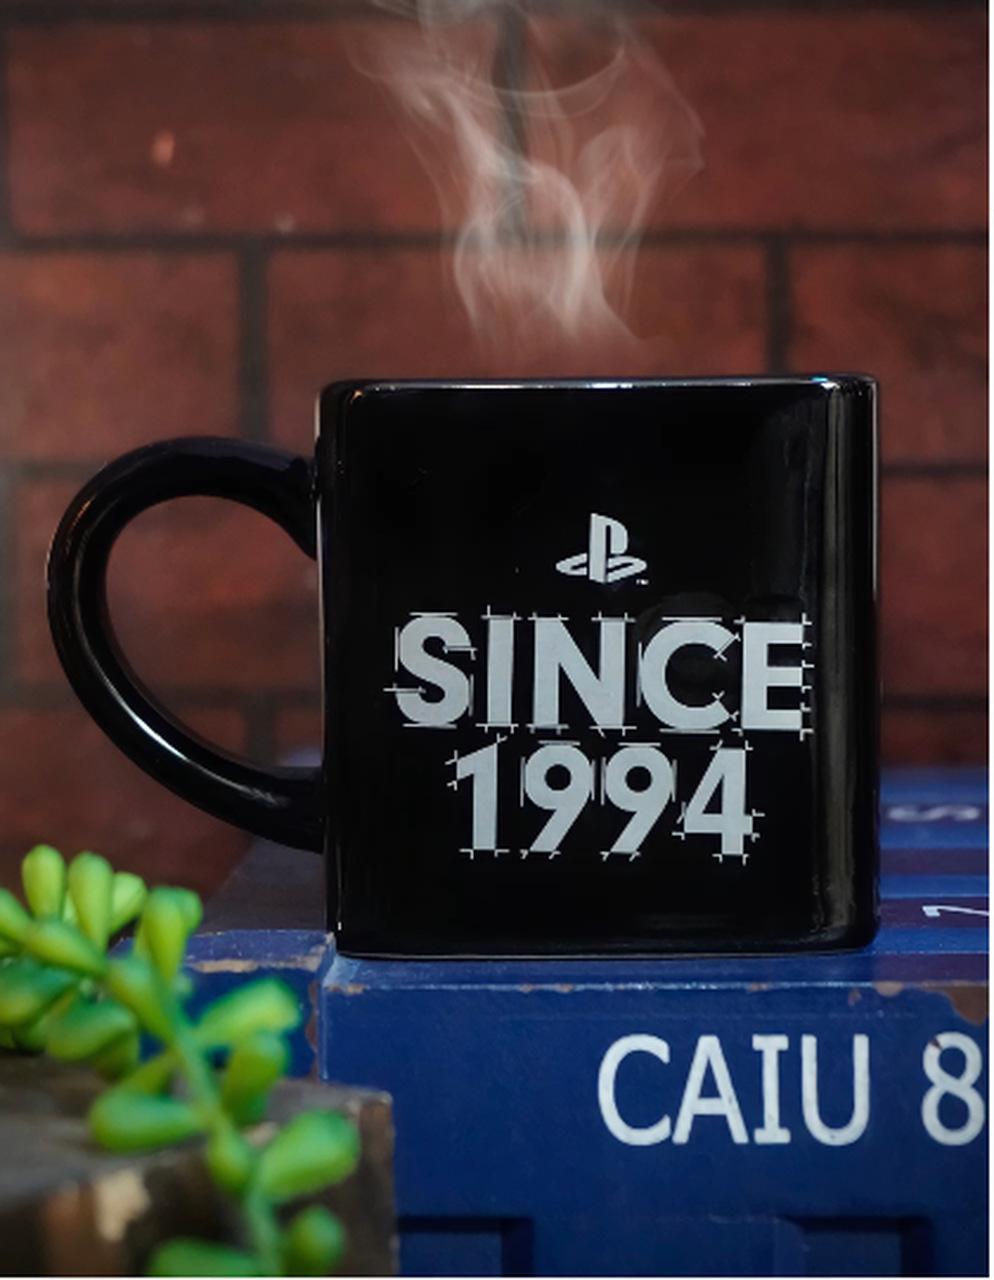 Caneca Cubo Playstation Clássico Since 1994 300ml - Zona Criativa